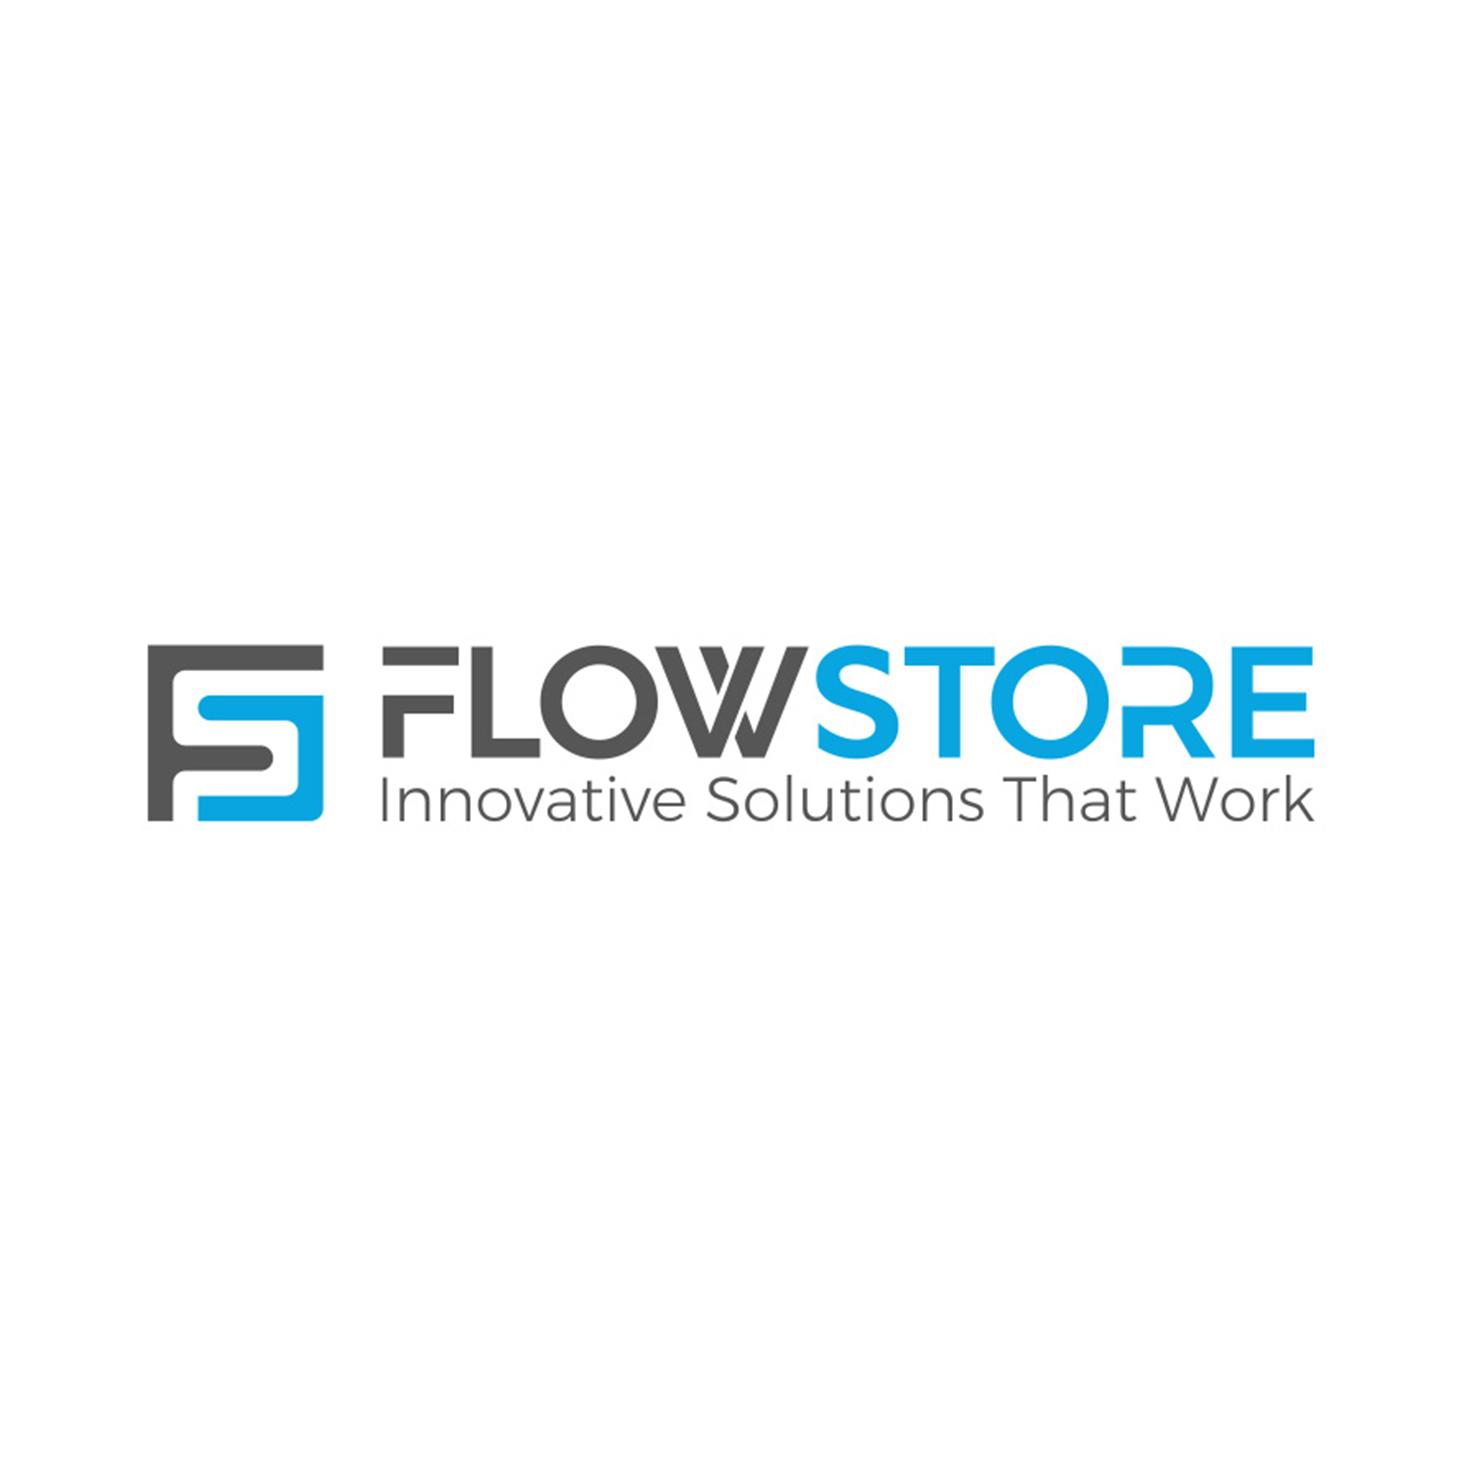 Flow store